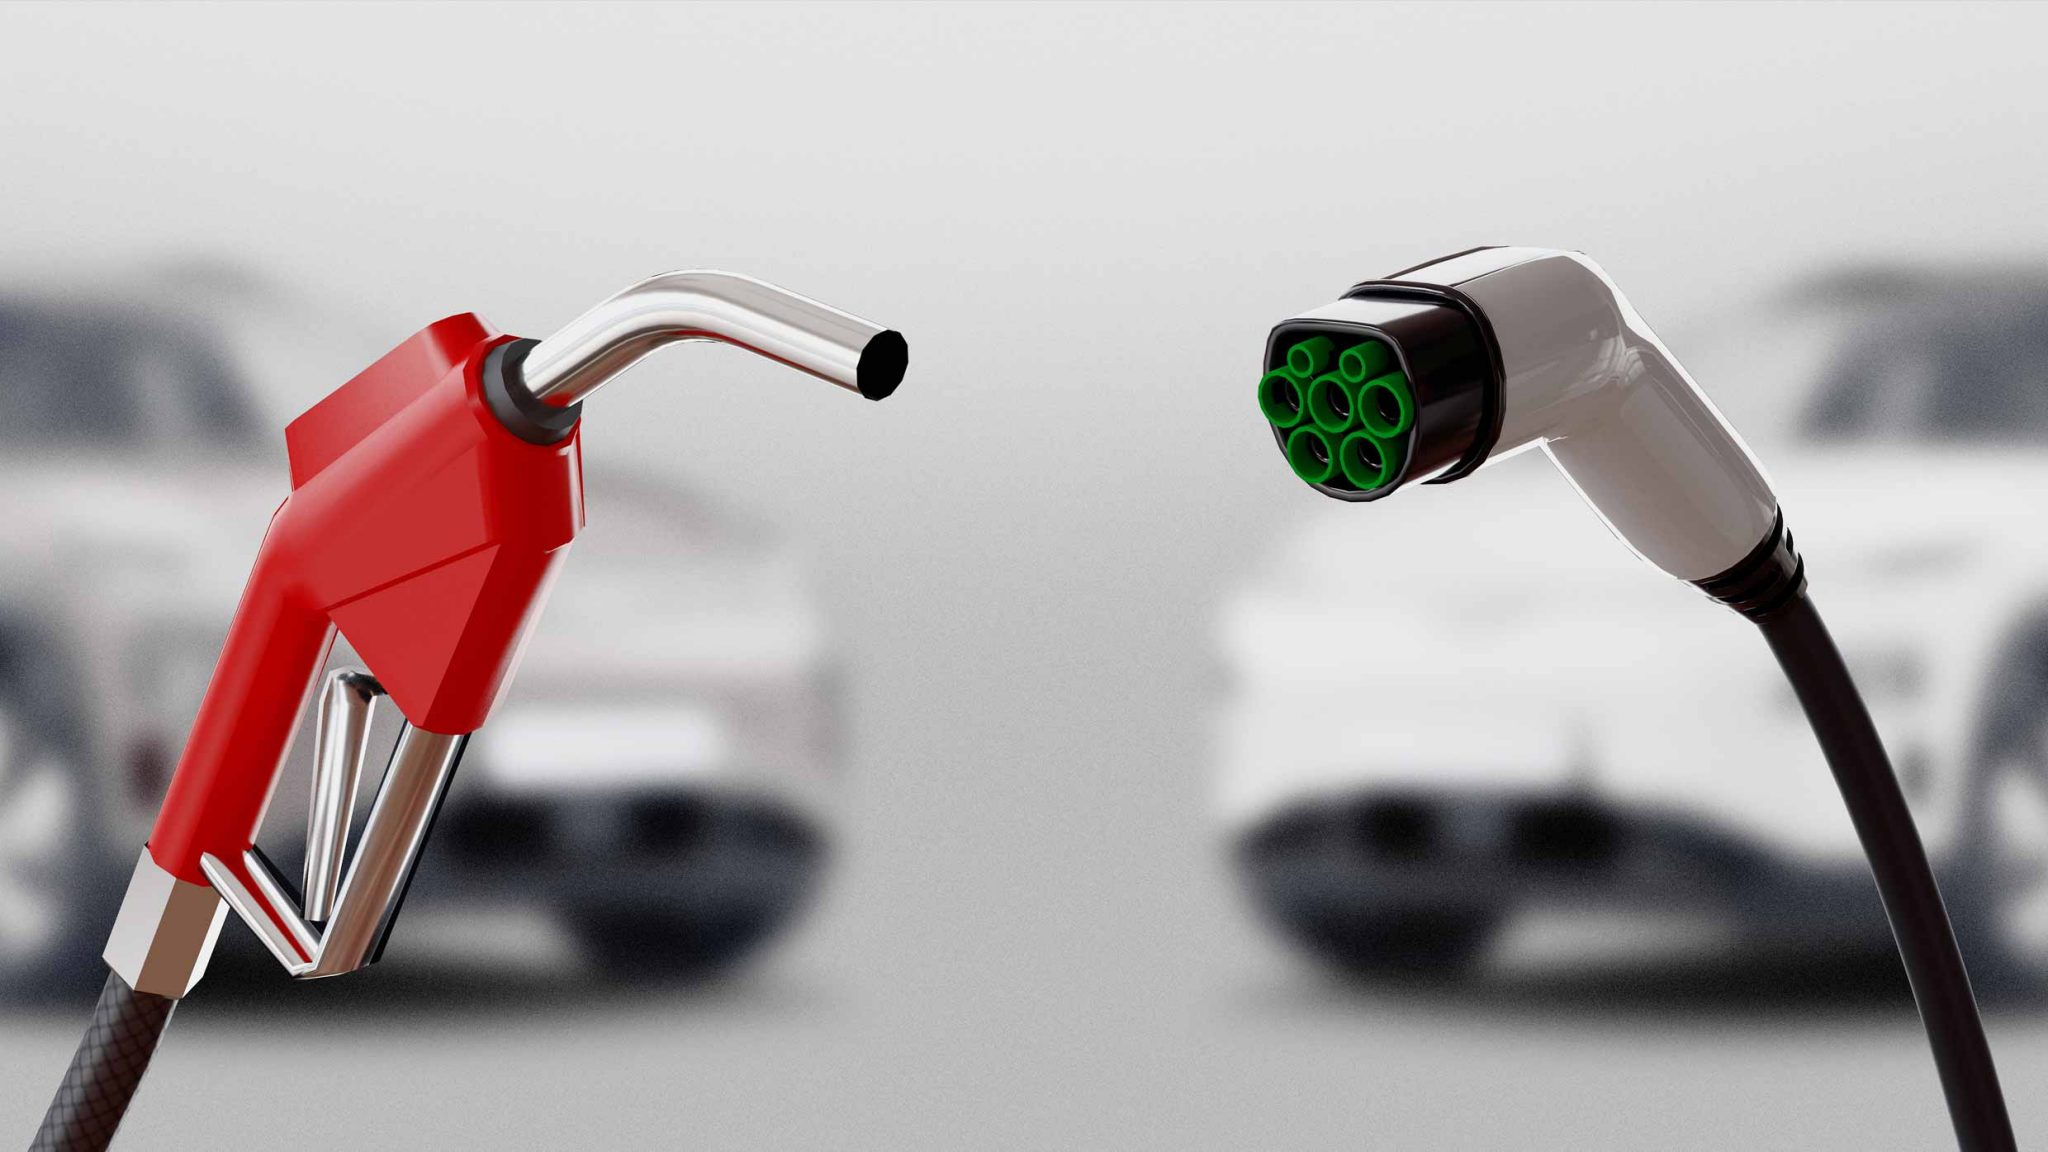 Petrol pump nozzel and plug to charge EV